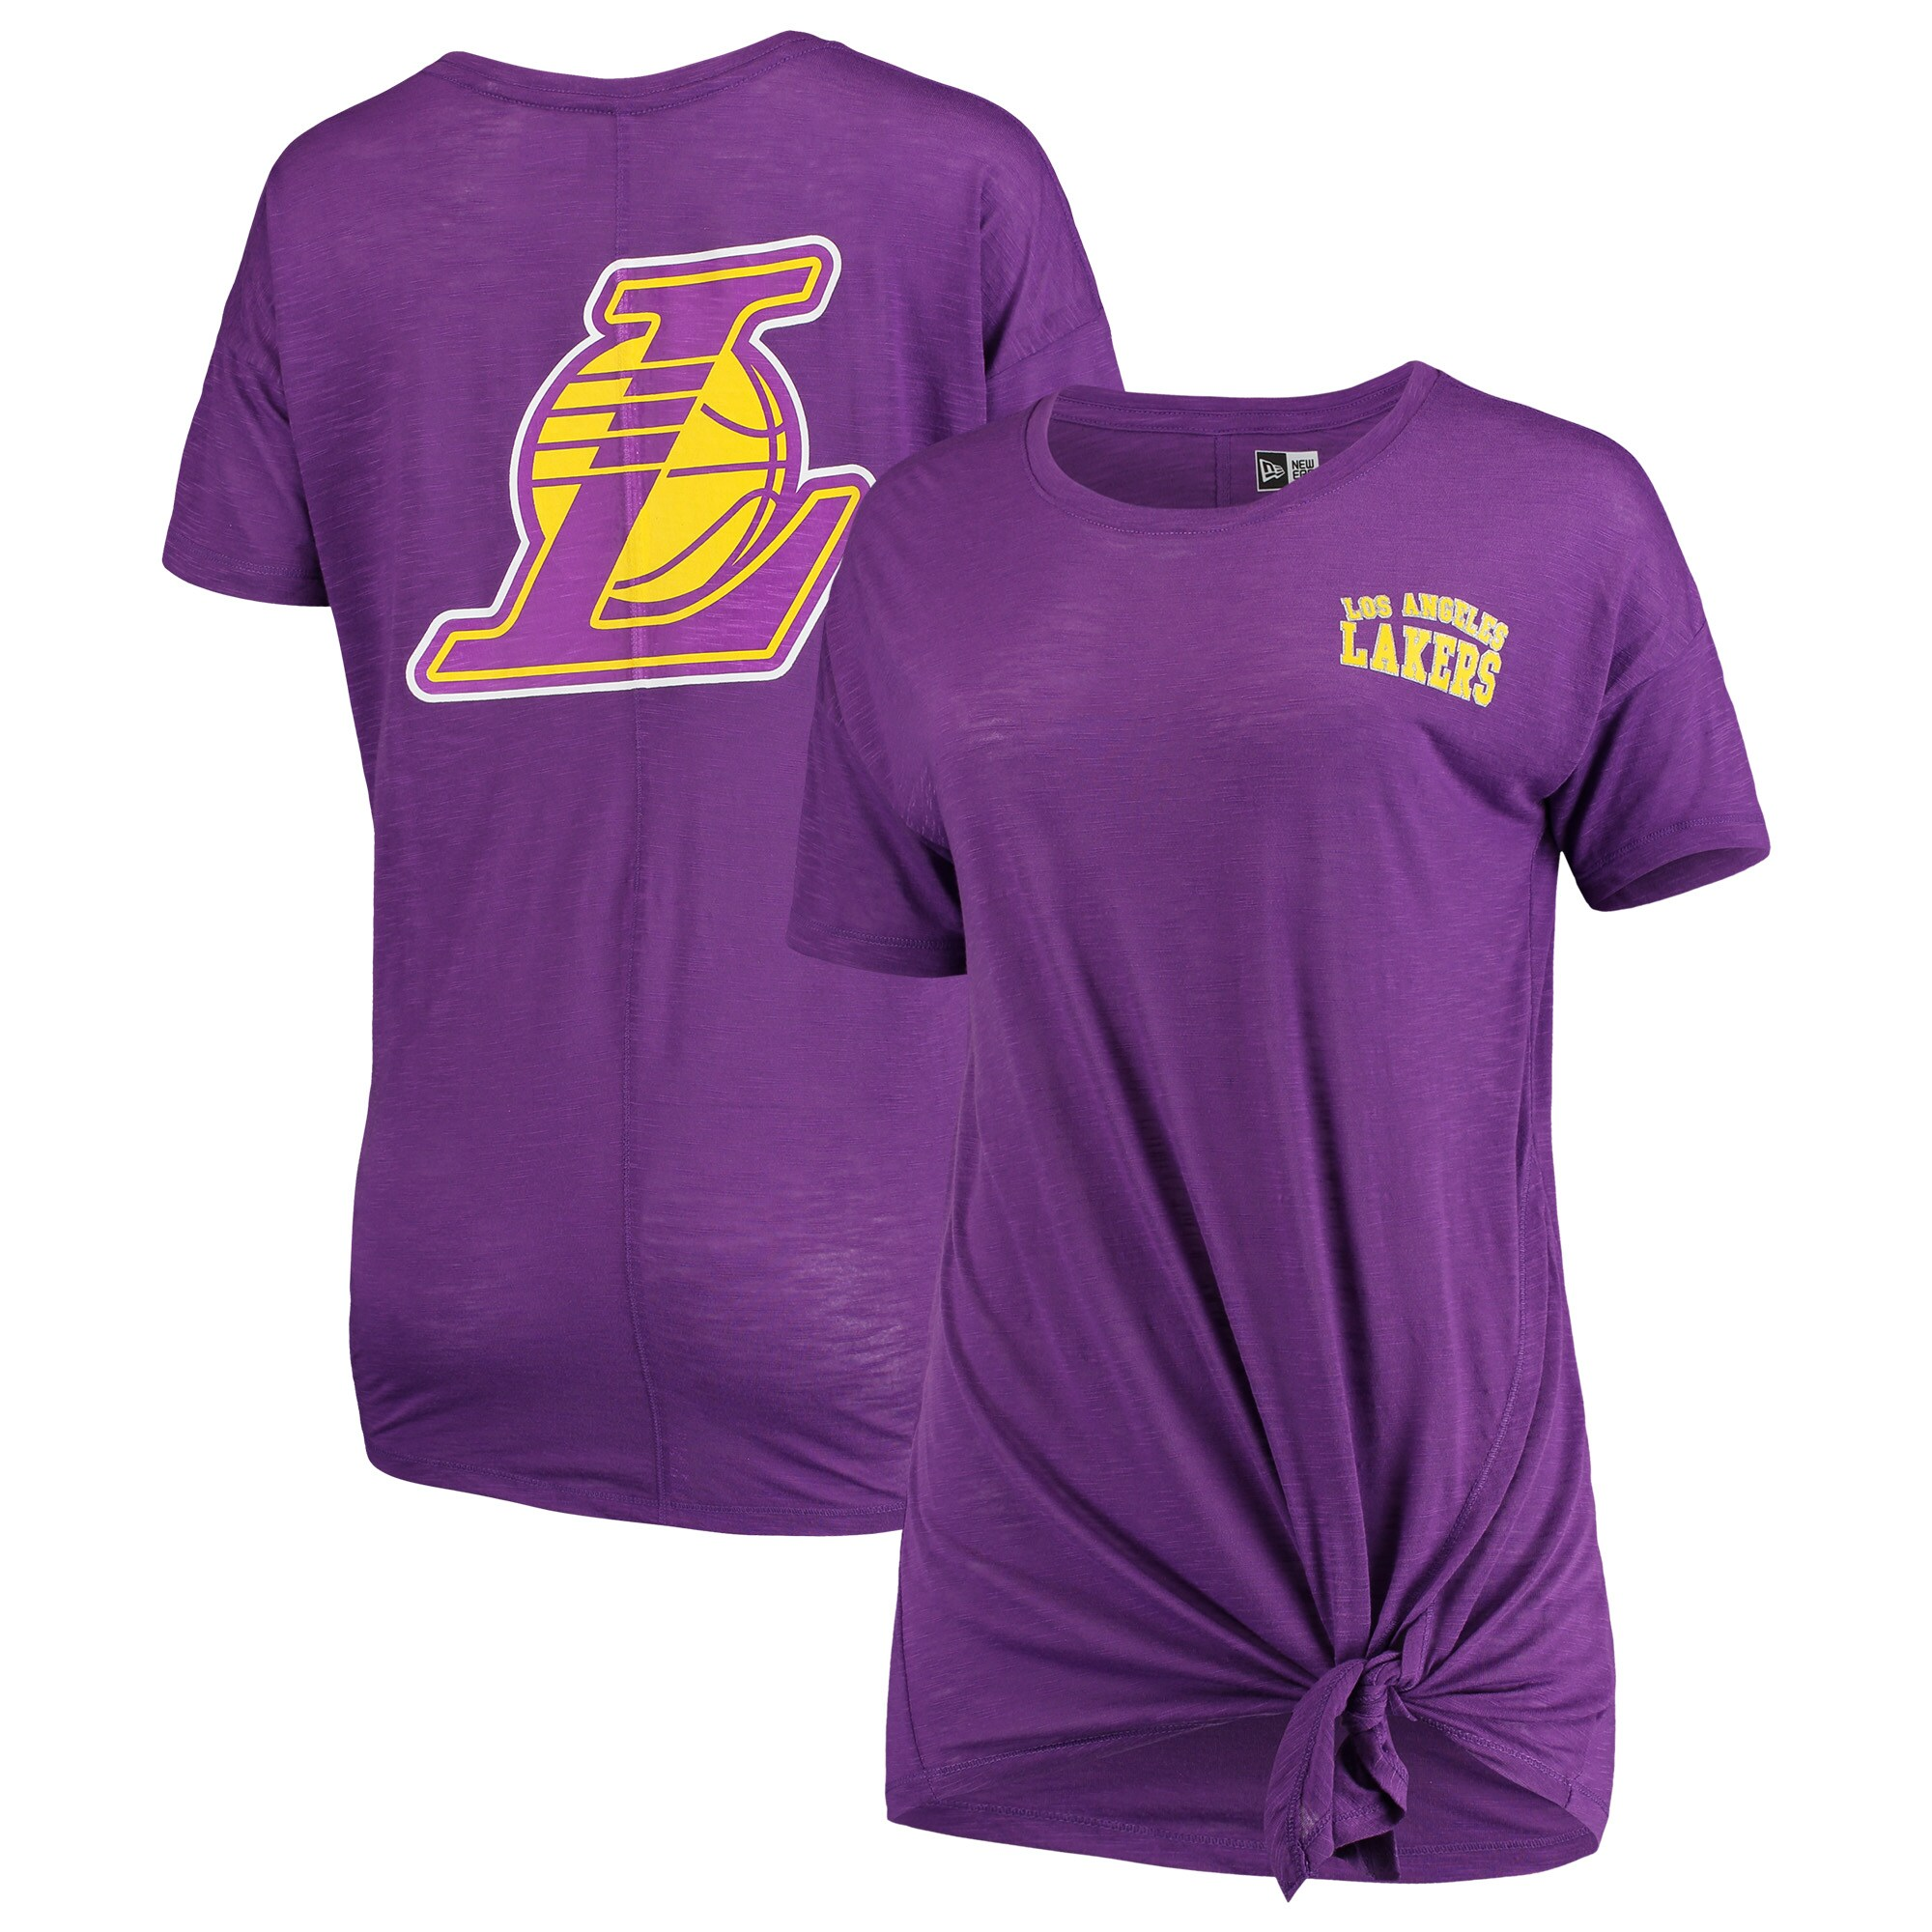 Los Angeles Lakers New Era Women's Side-Tie Slub T-Shirt - Purple